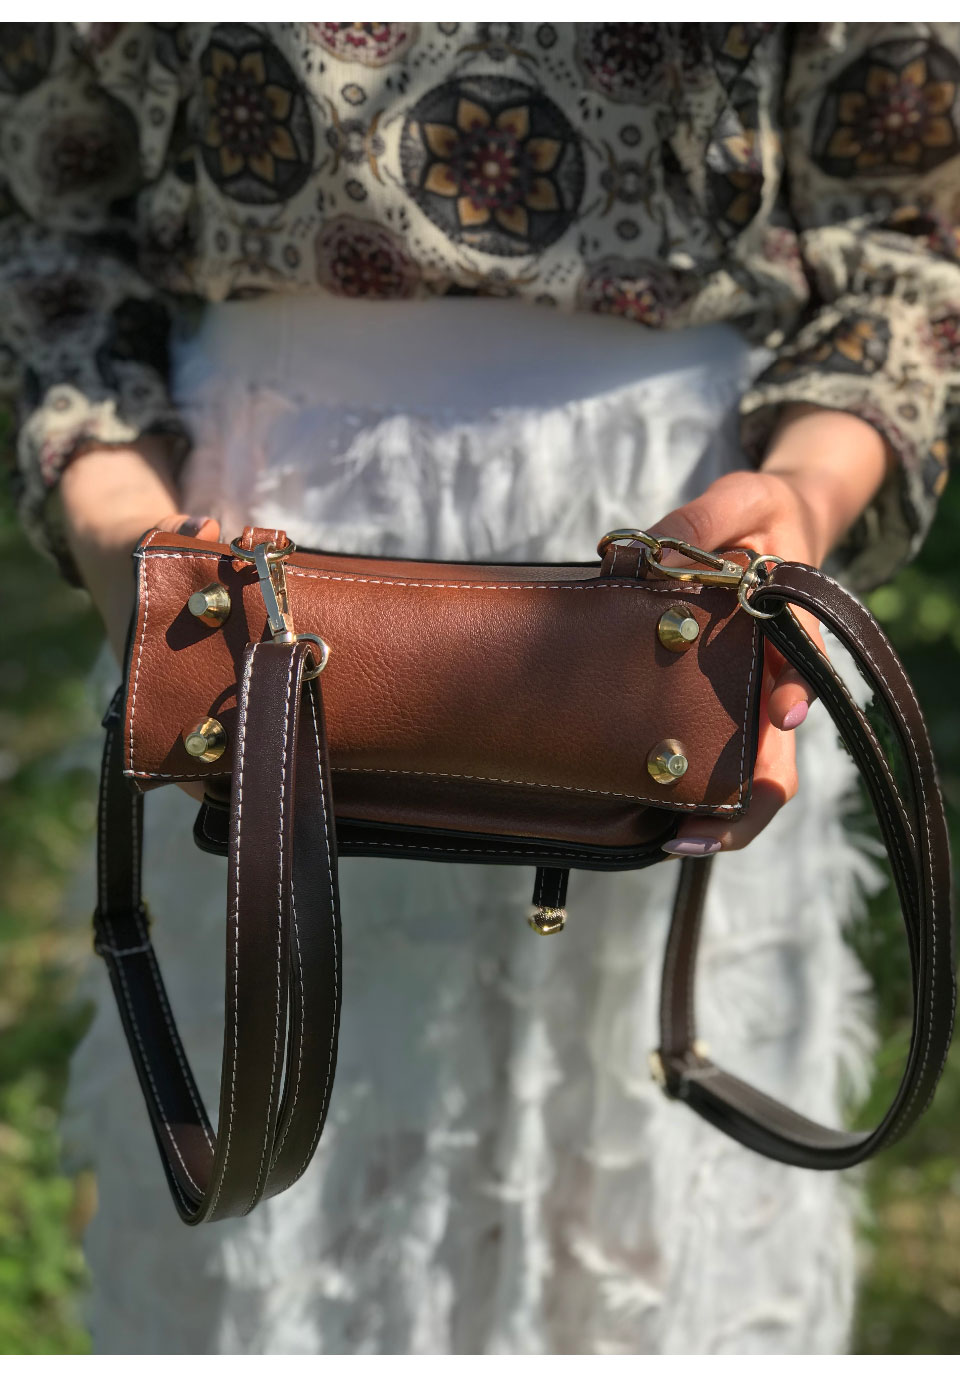 HTB1NaM5bdzvK1RkSnfoq6zMwVXaU CASMOR Vintage Backpacks Women Classic Old School For Girls Fashion School bag PU Leather High Quality College Backpack